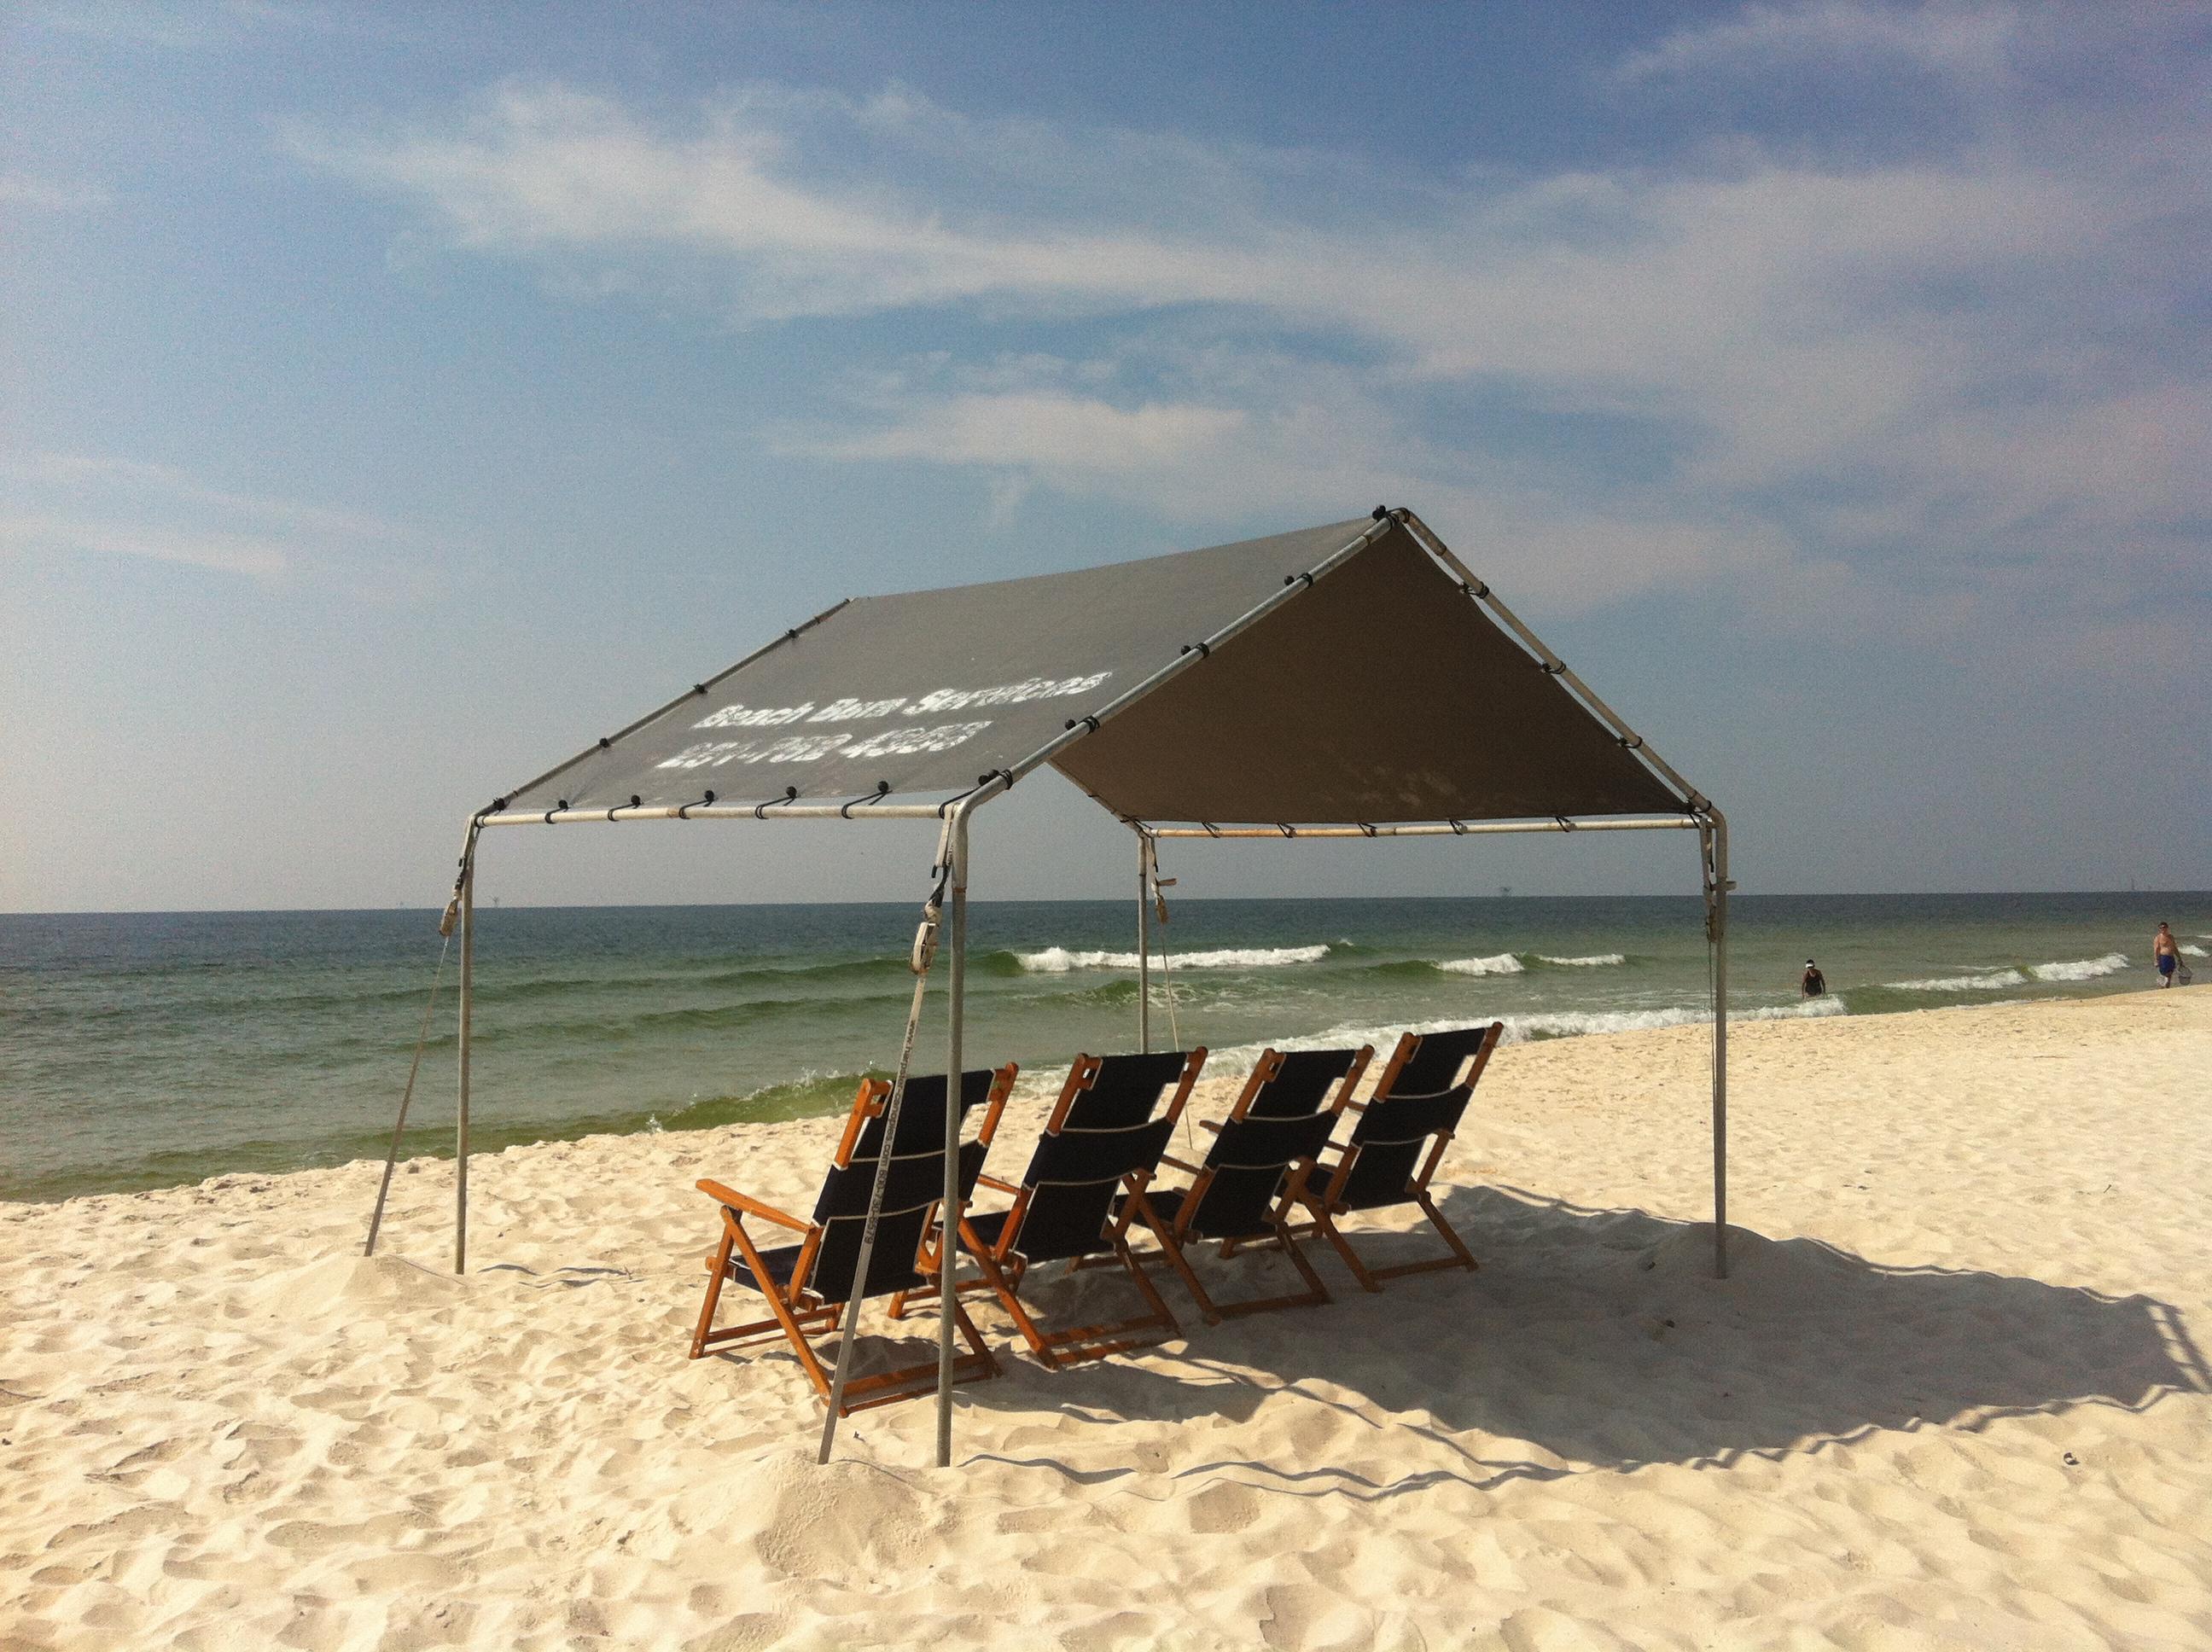 10u2032 x 10u2032 beach canopy and 4 lounge chairs JGMPSRO